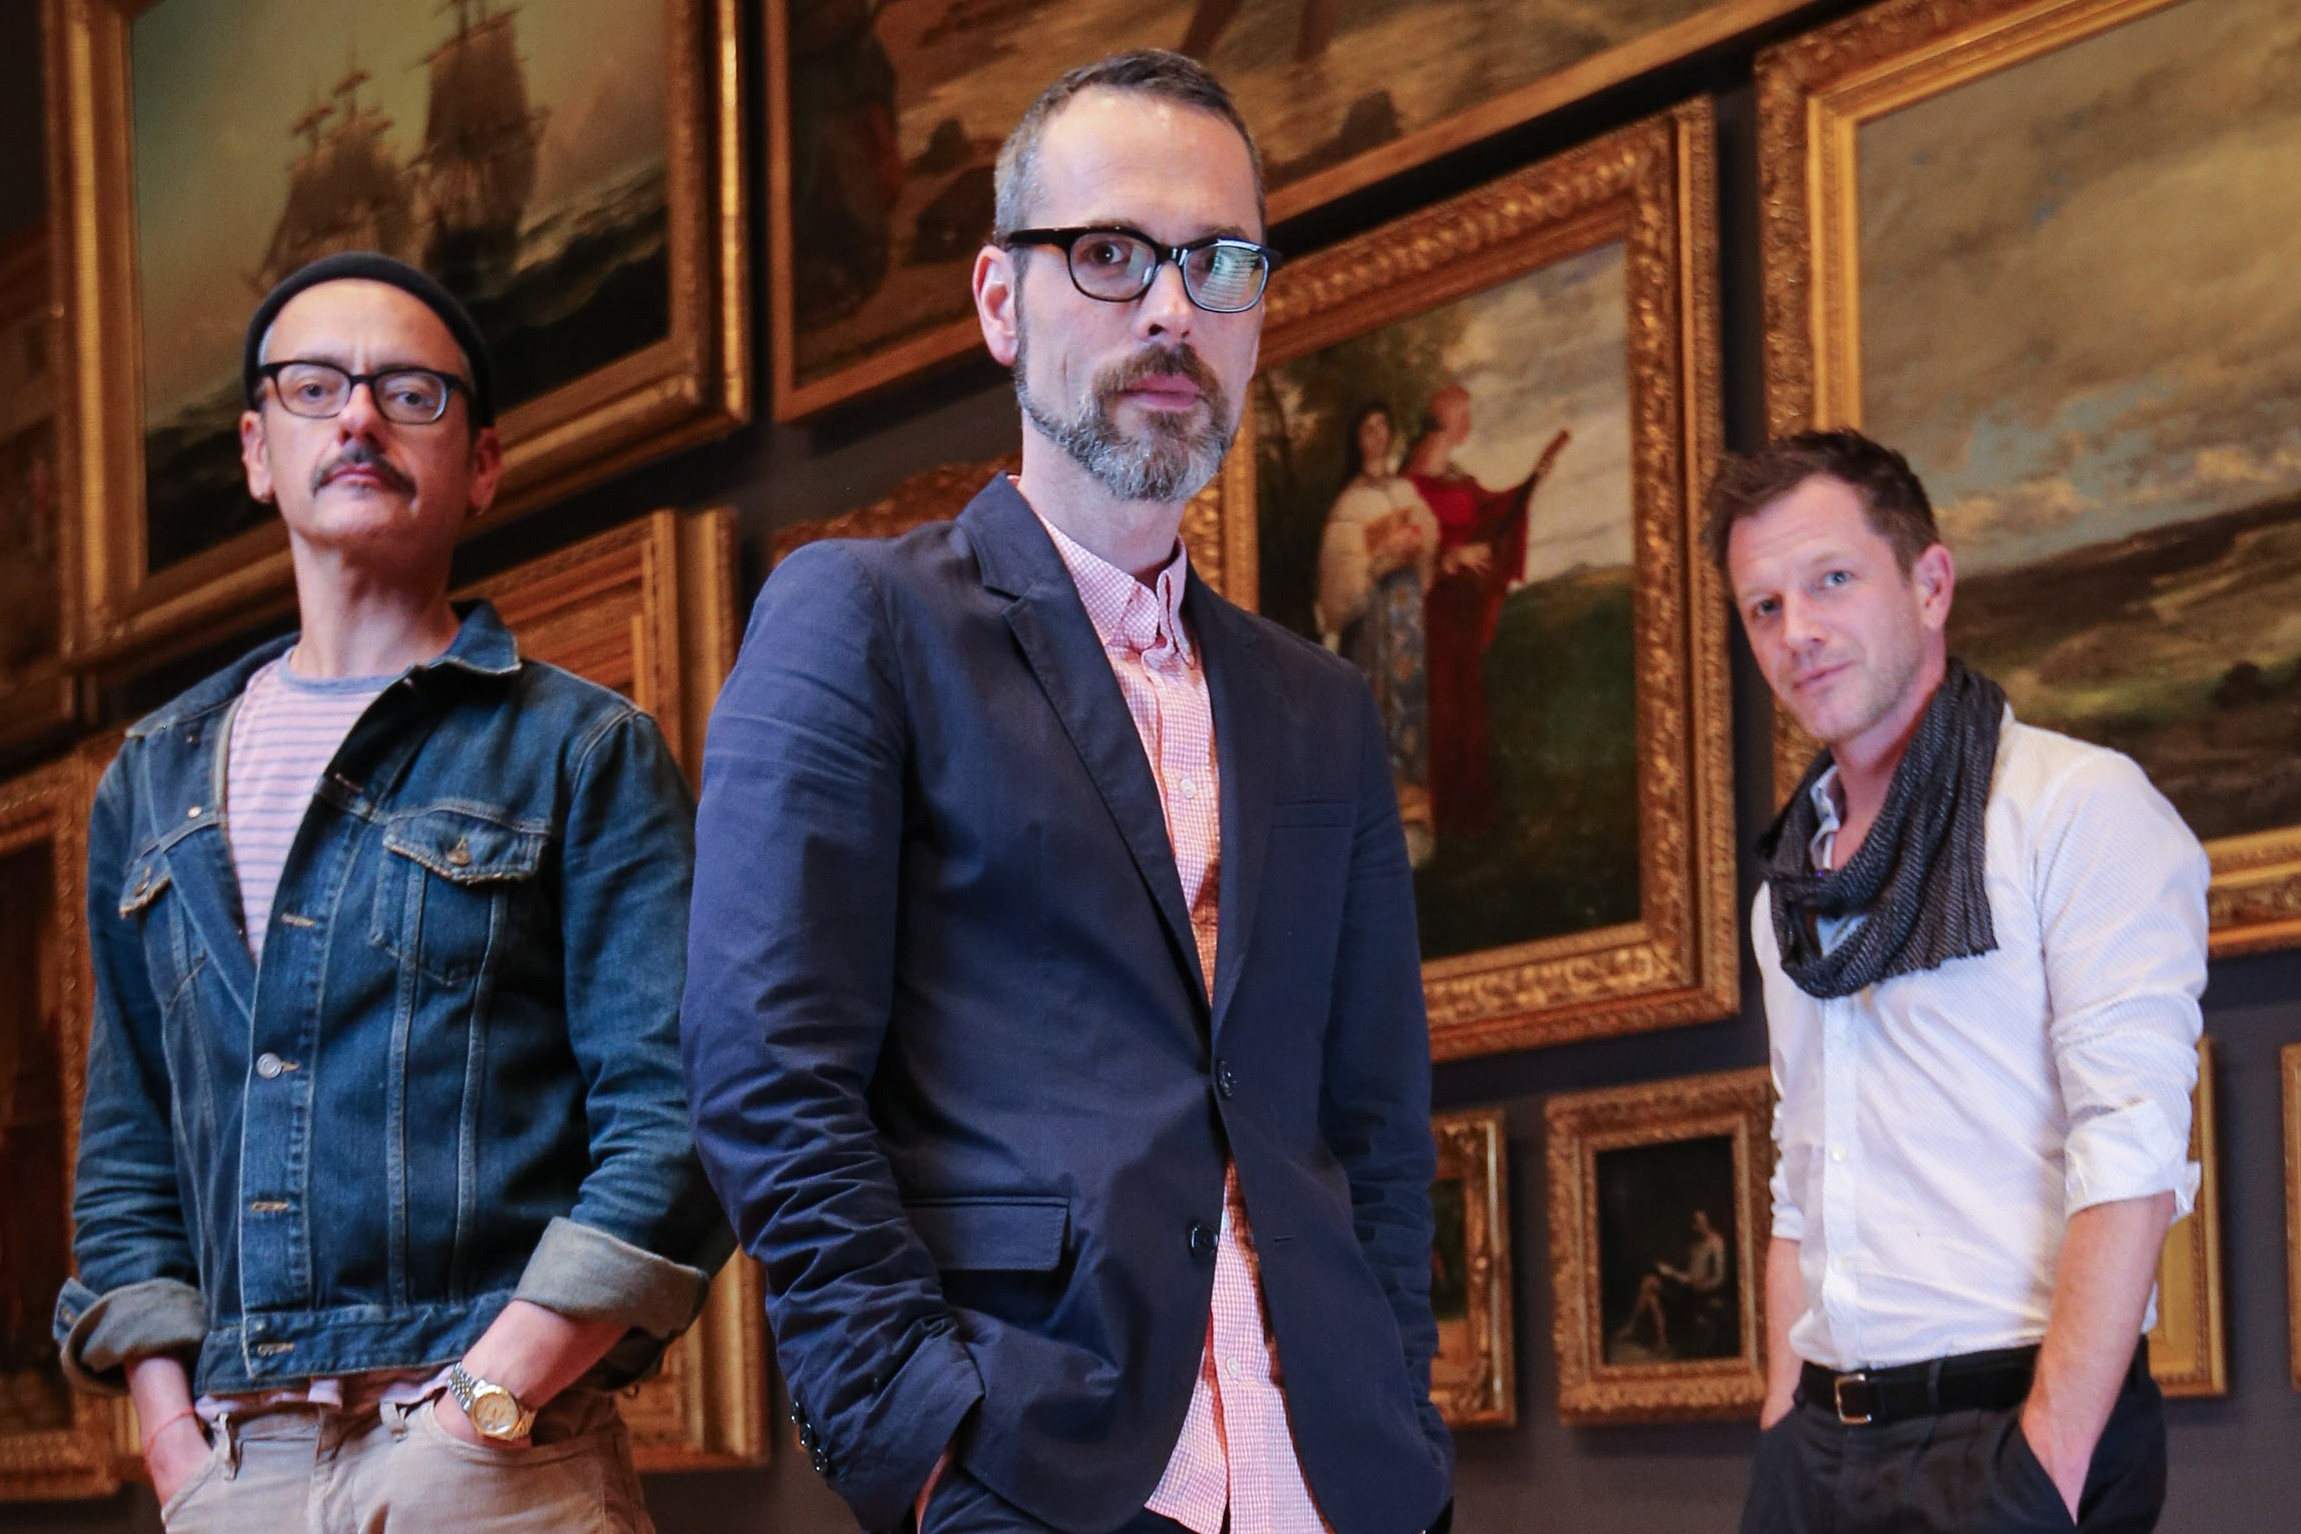 Viktor & Rolf's exhibition opens in Melbourne